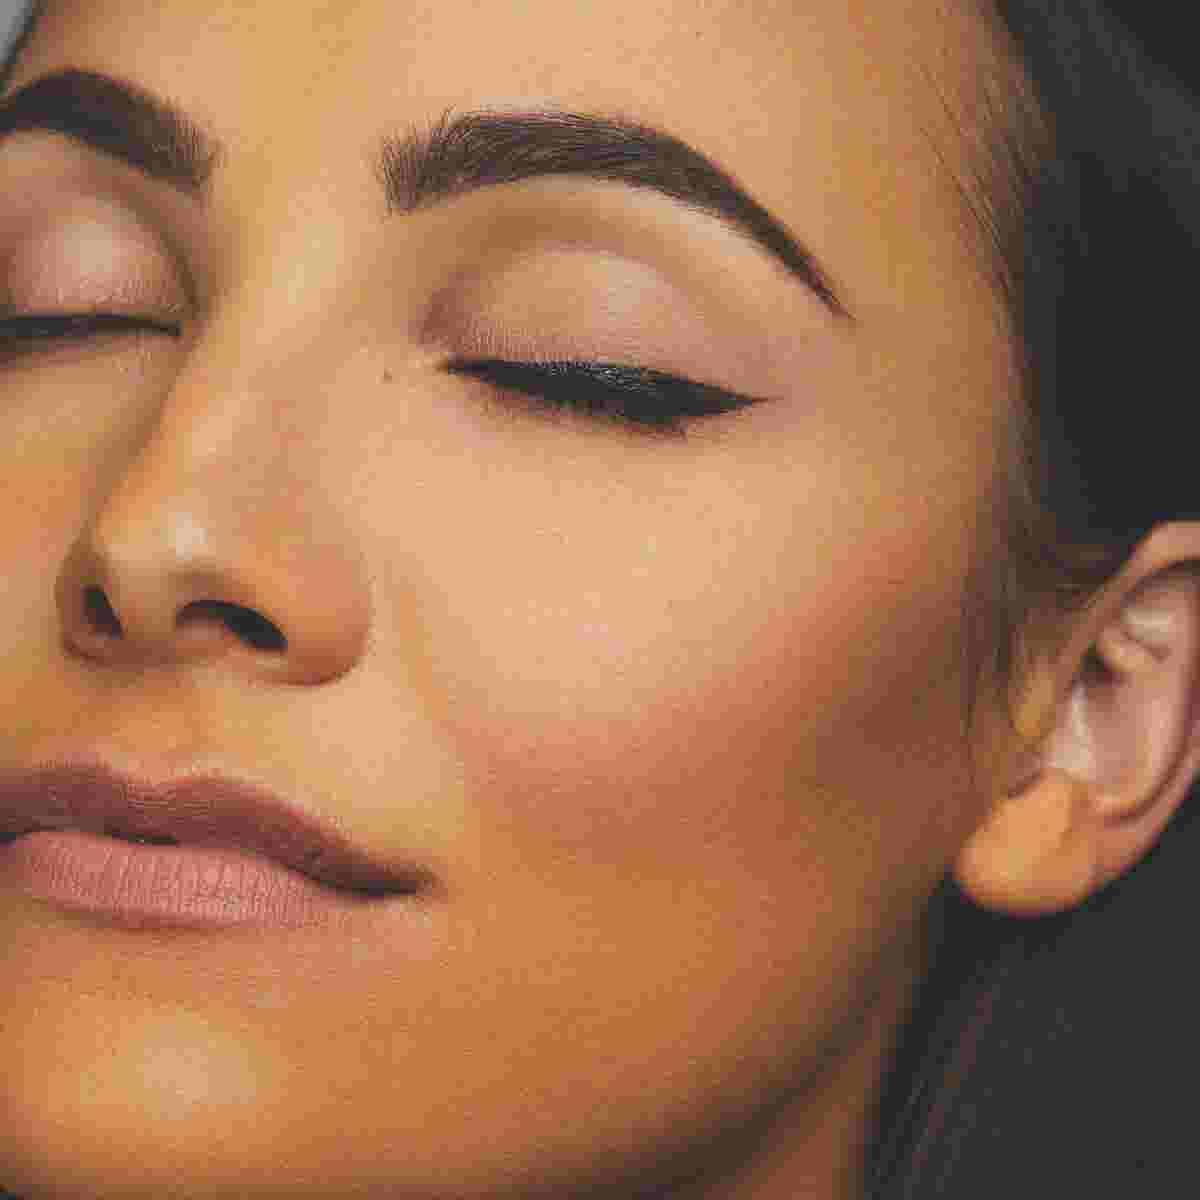 Winged eyeliner tutorial step three